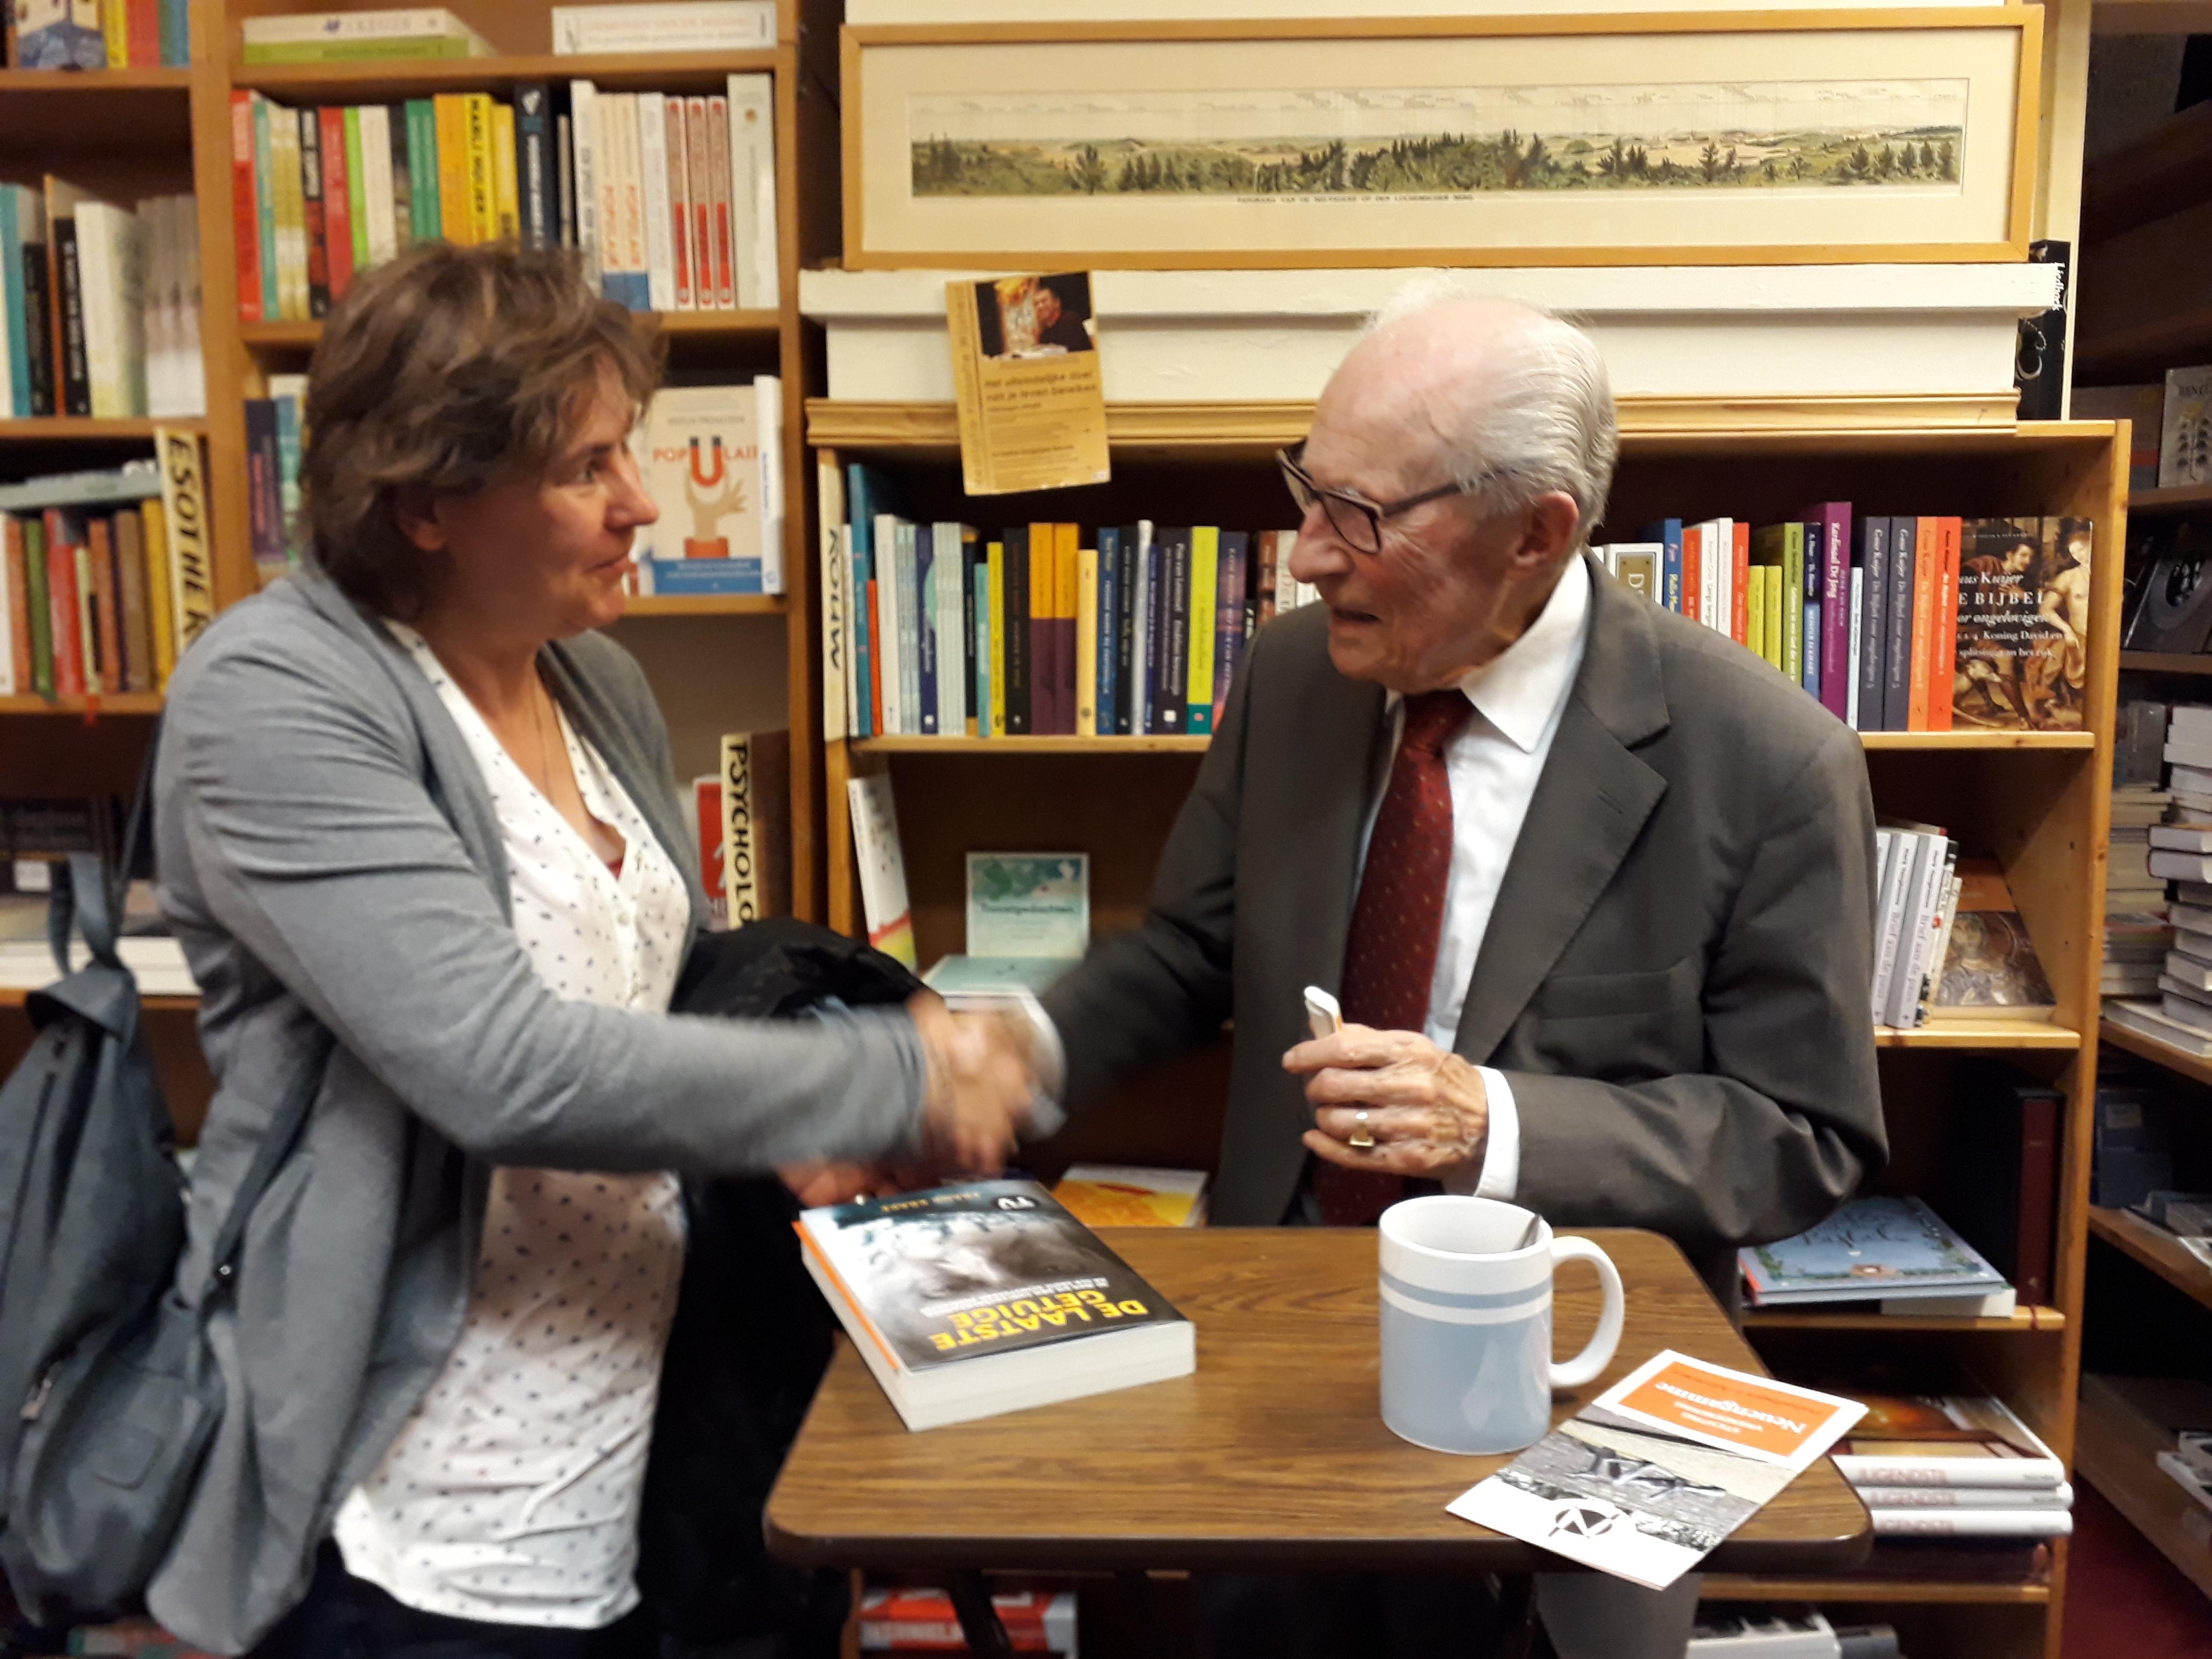 veerkracht ontwikkeling, Natasja Kardos met Wim Aloserij